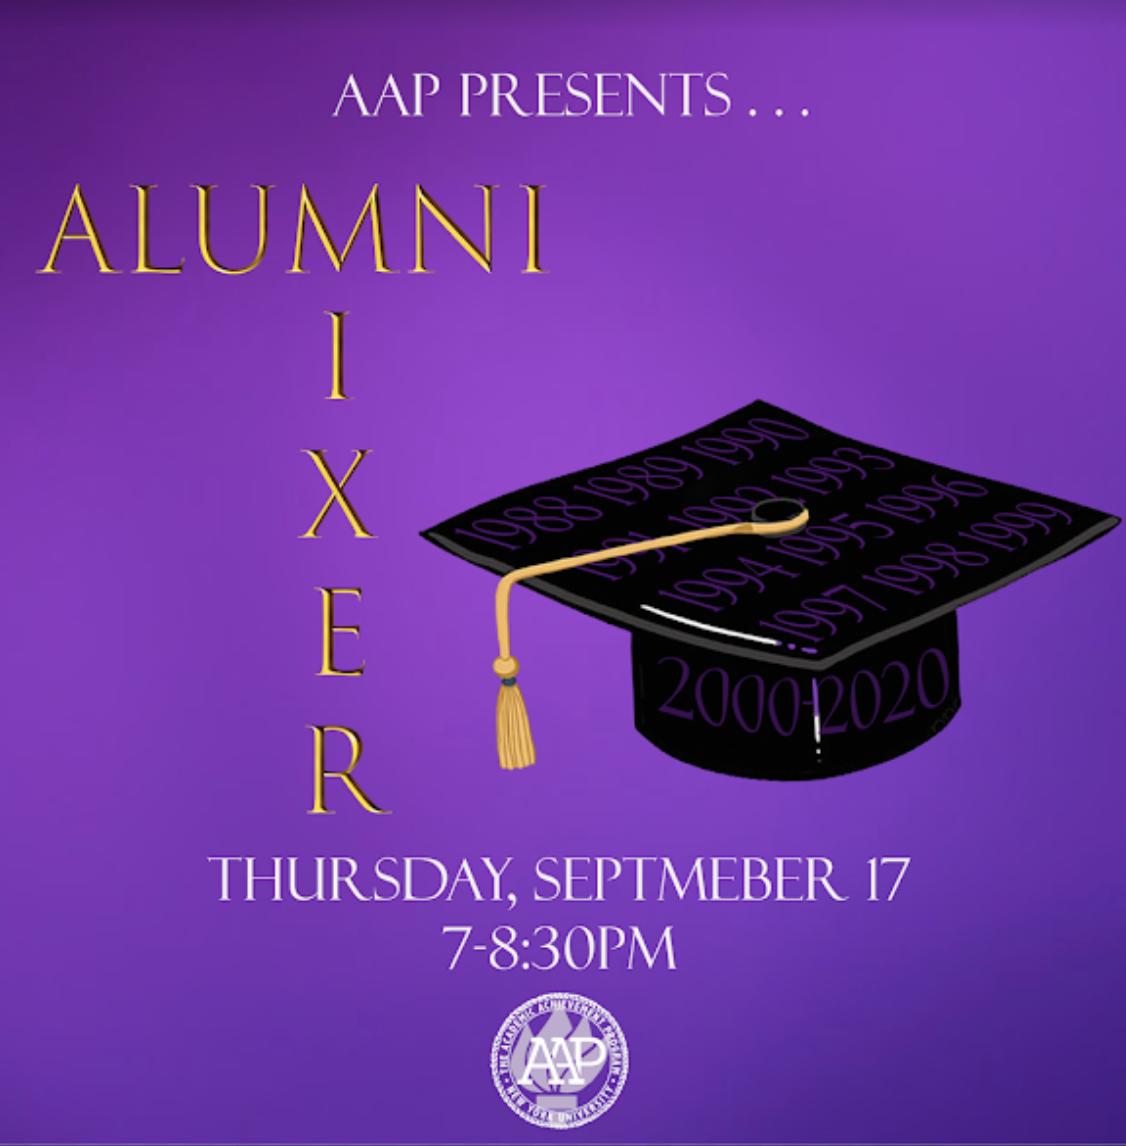 AAP Alumni Mixer Photo